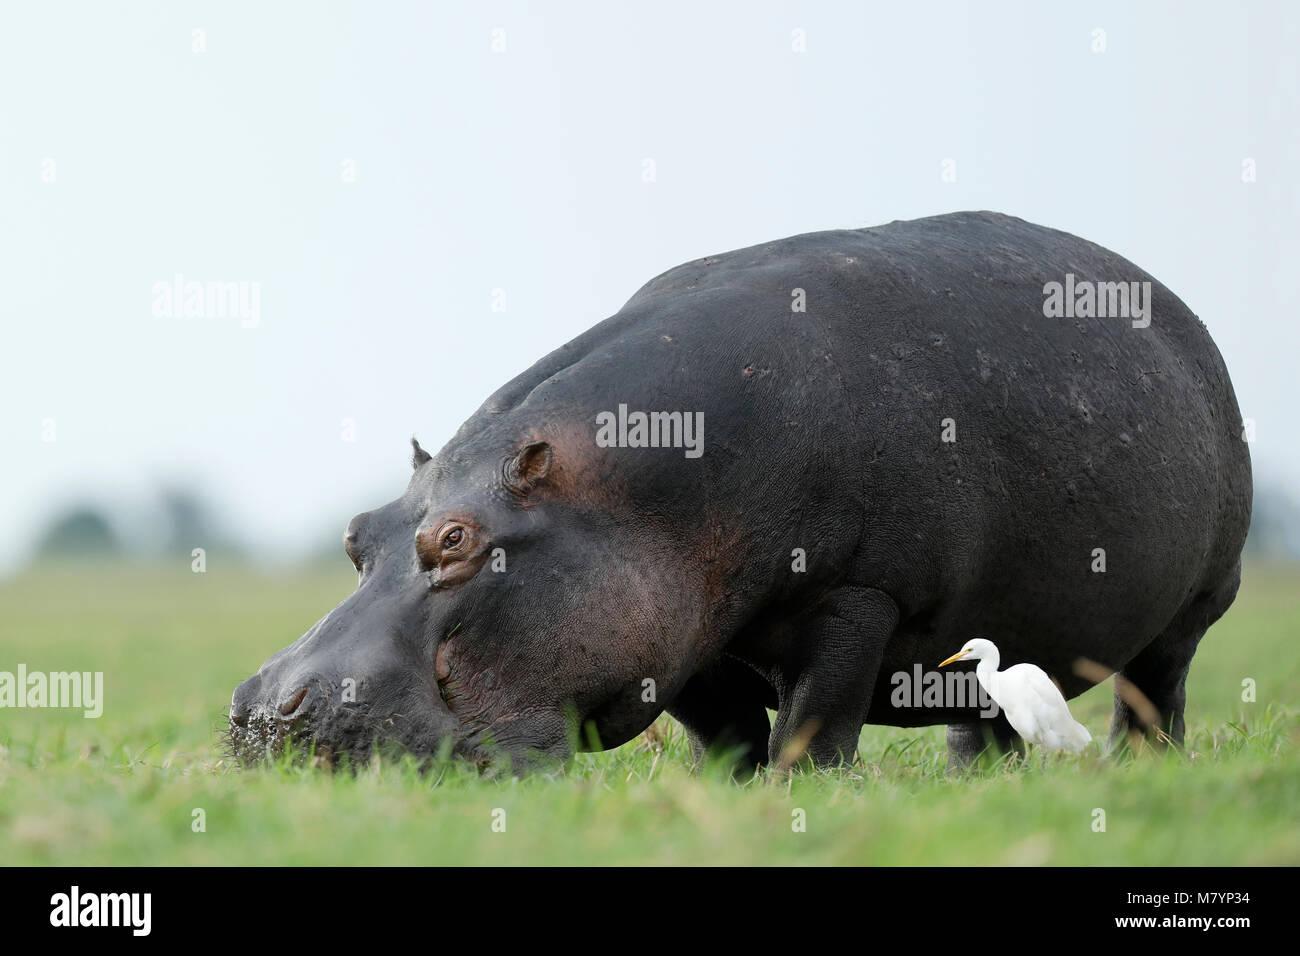 Hippo in Chobe National Park, Botswana - Stock Image